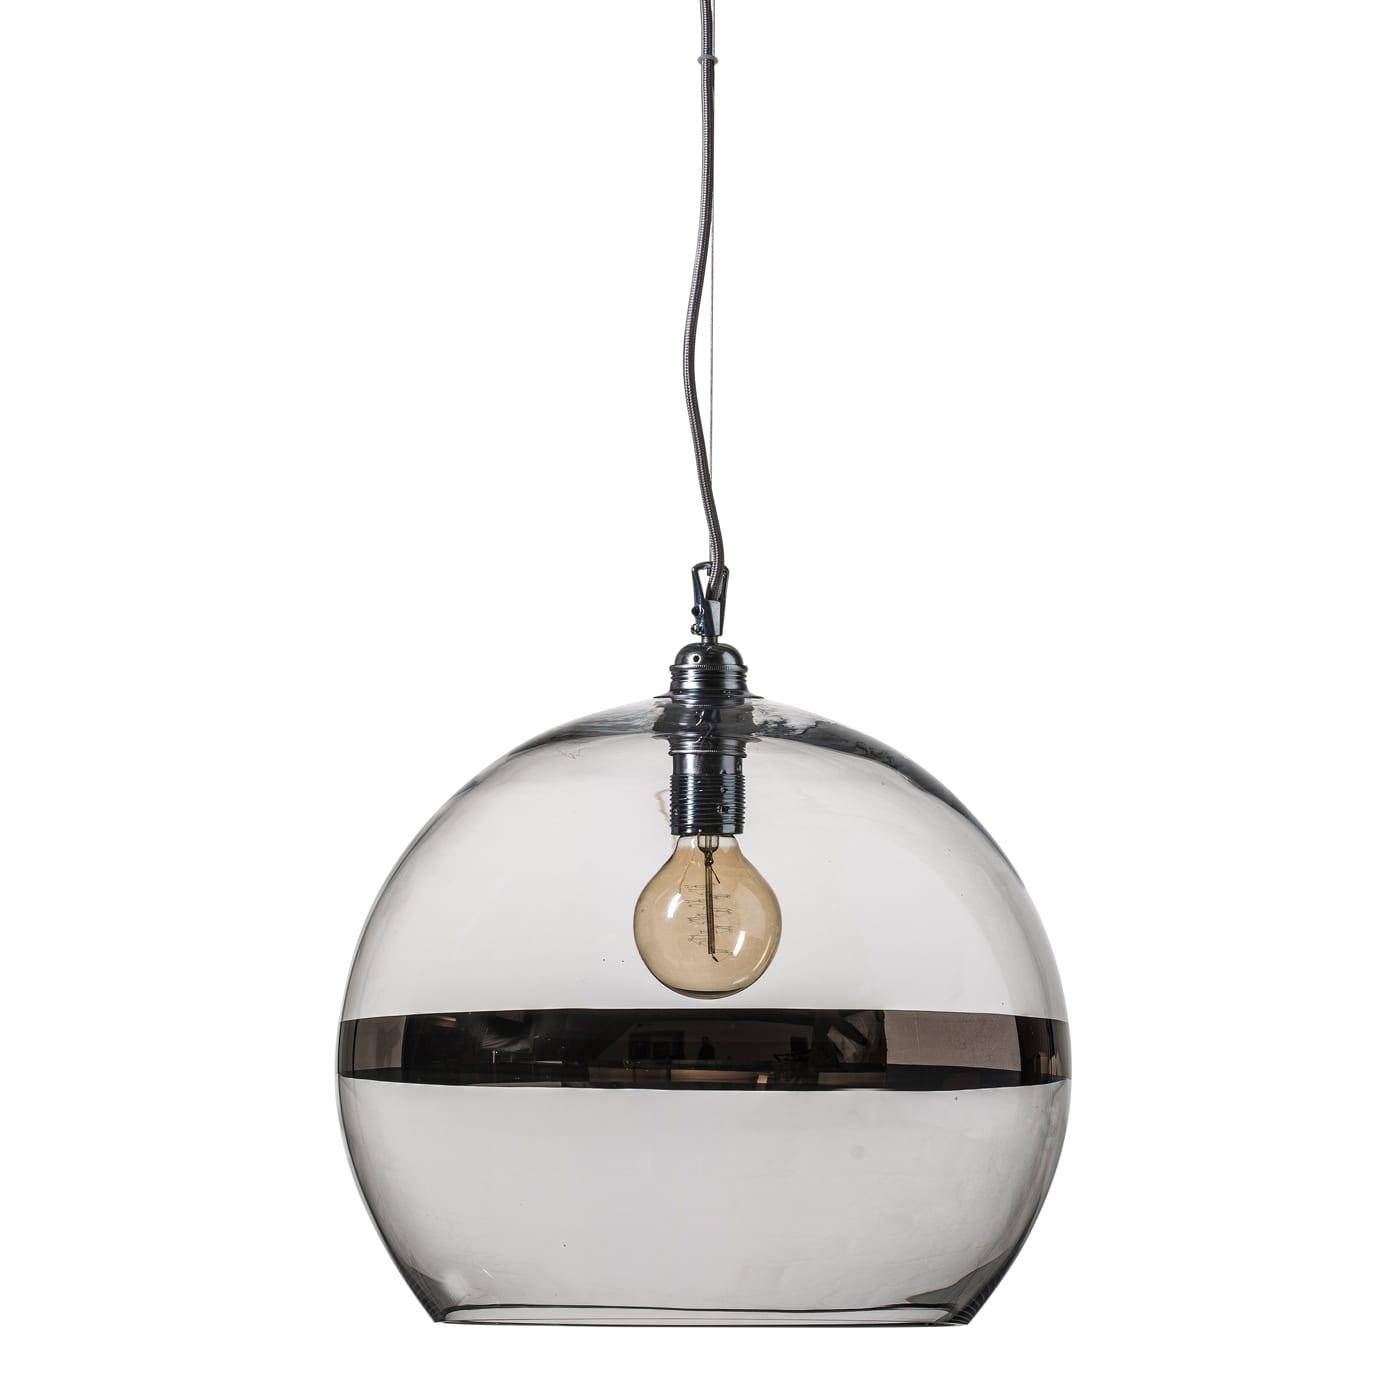 Rowan pendant lamp, platinum stripe on clear, 39cm